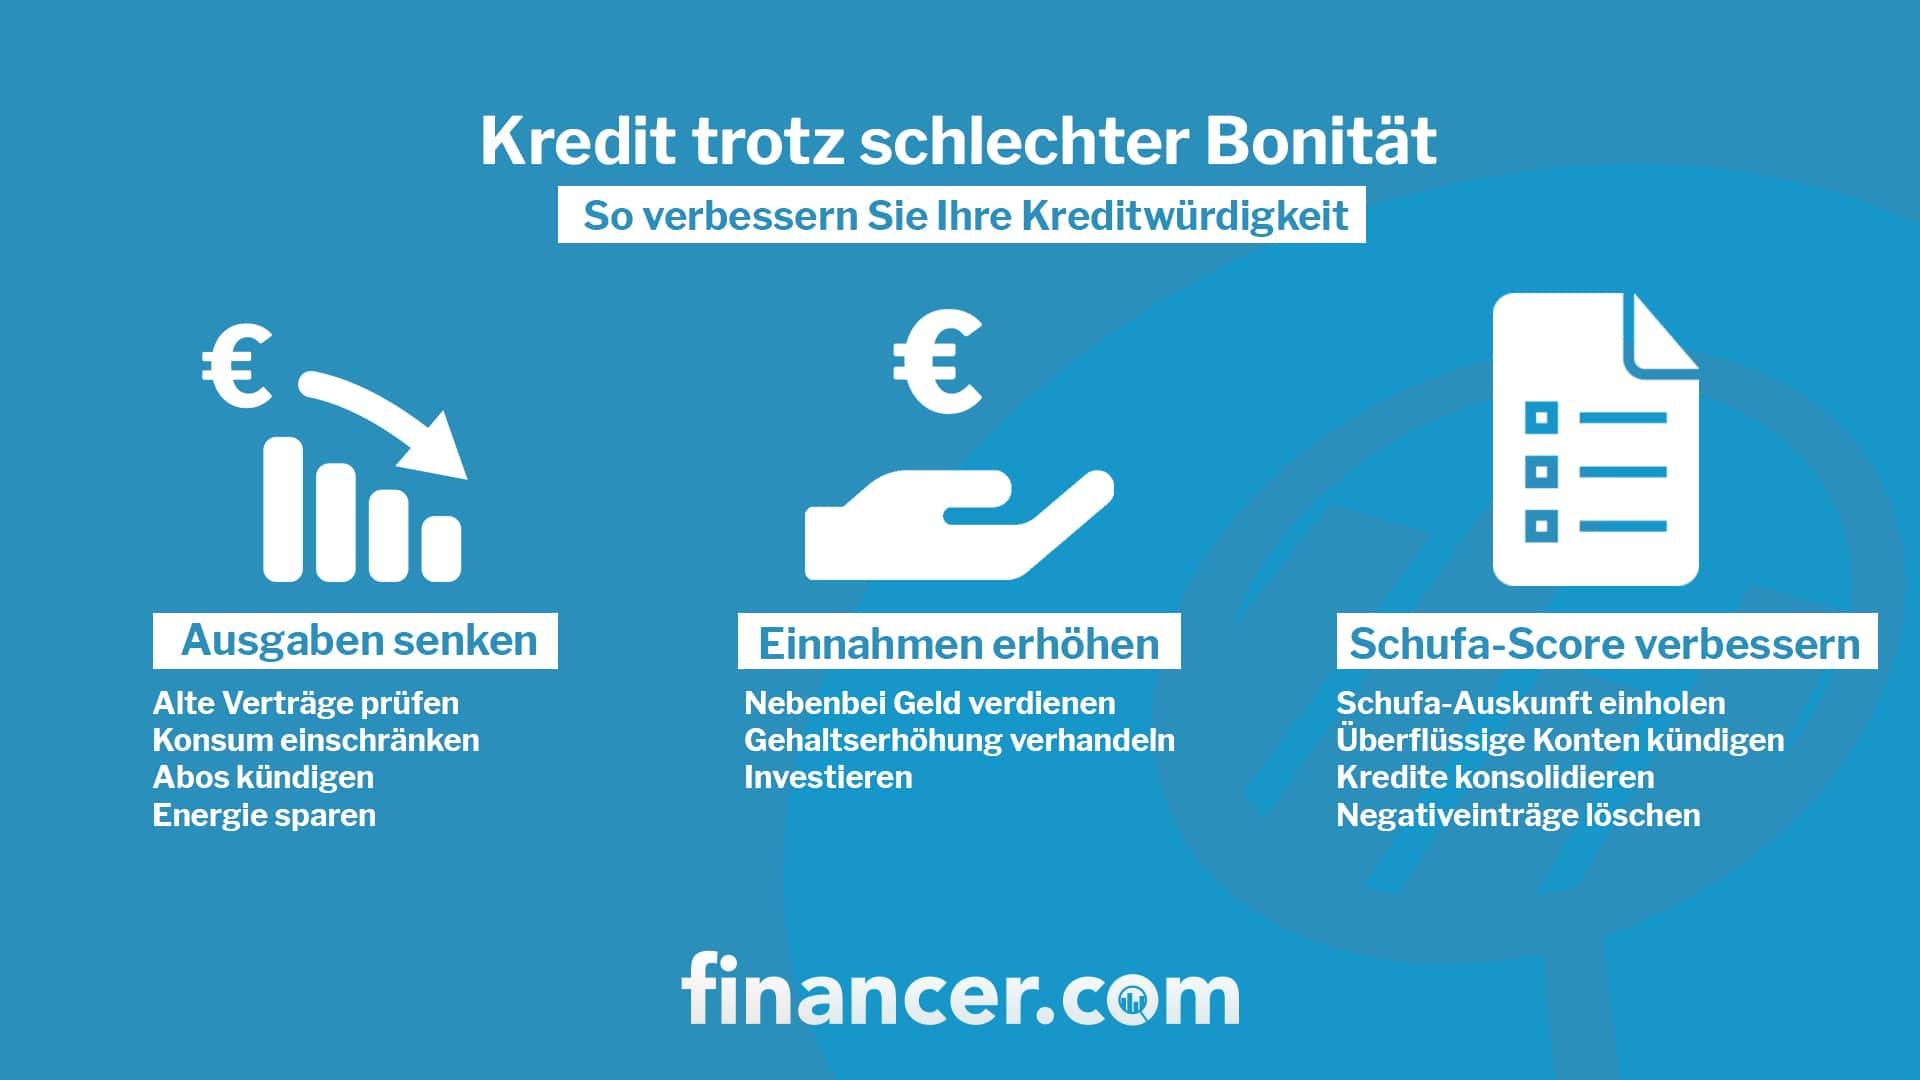 Kredit-trotz-schlechter-Bonität-min